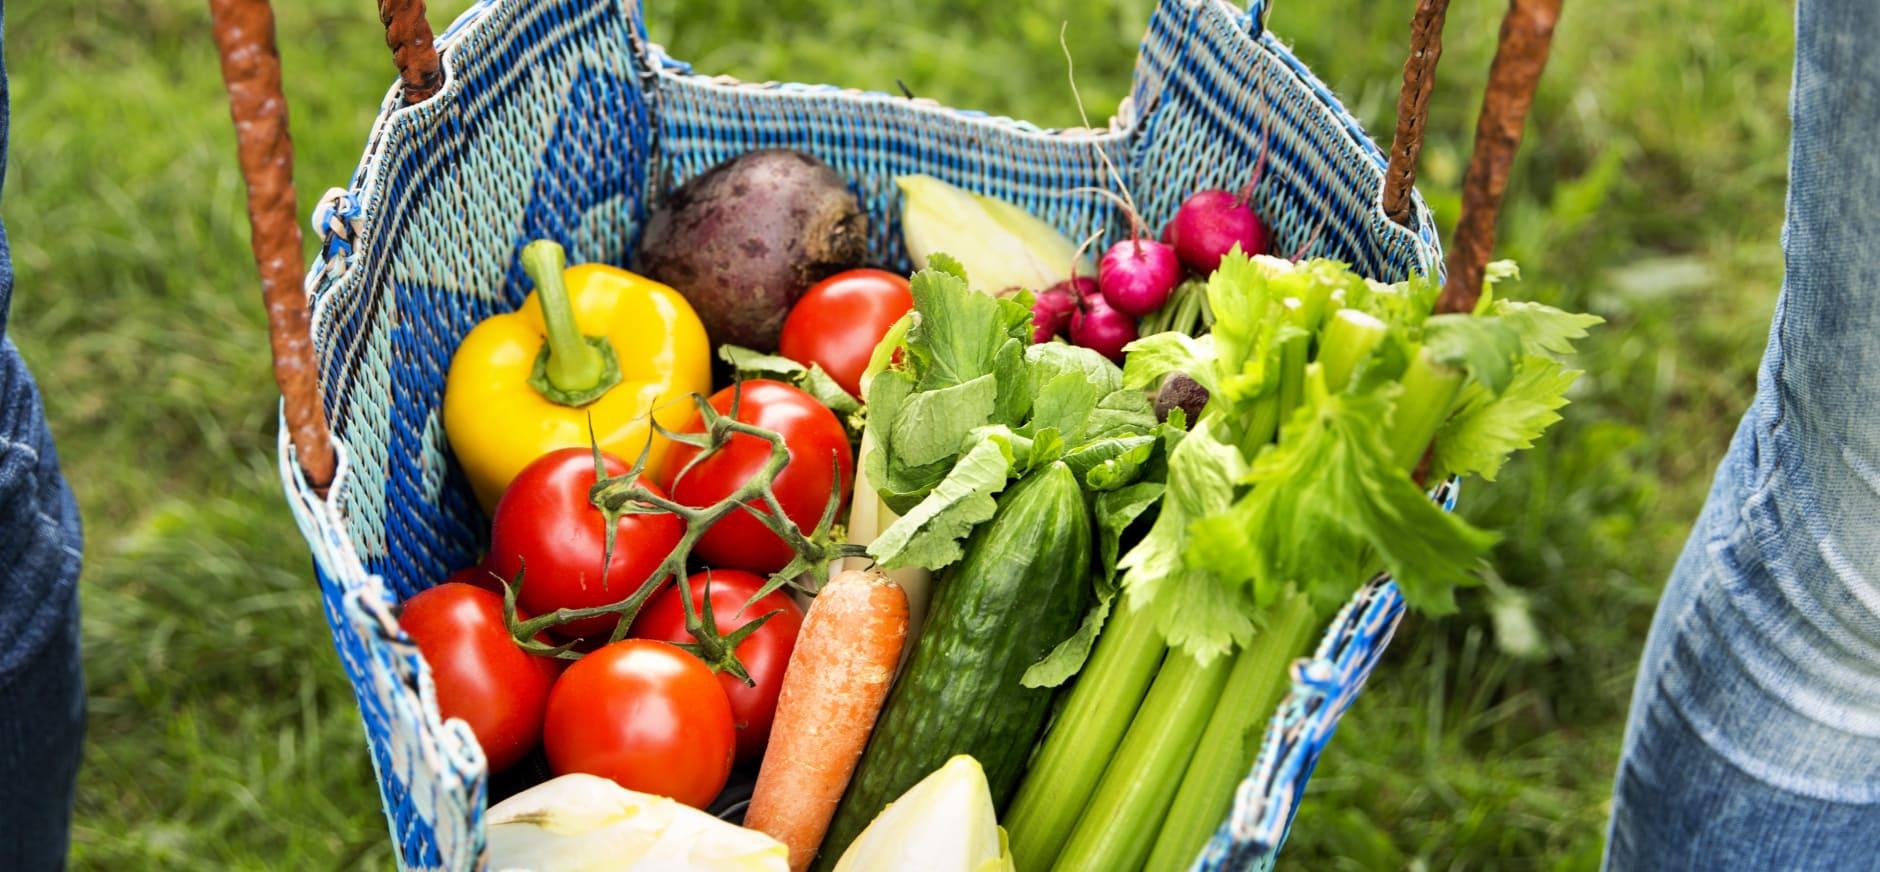 Praat mee over de toekomst van ons voedsel